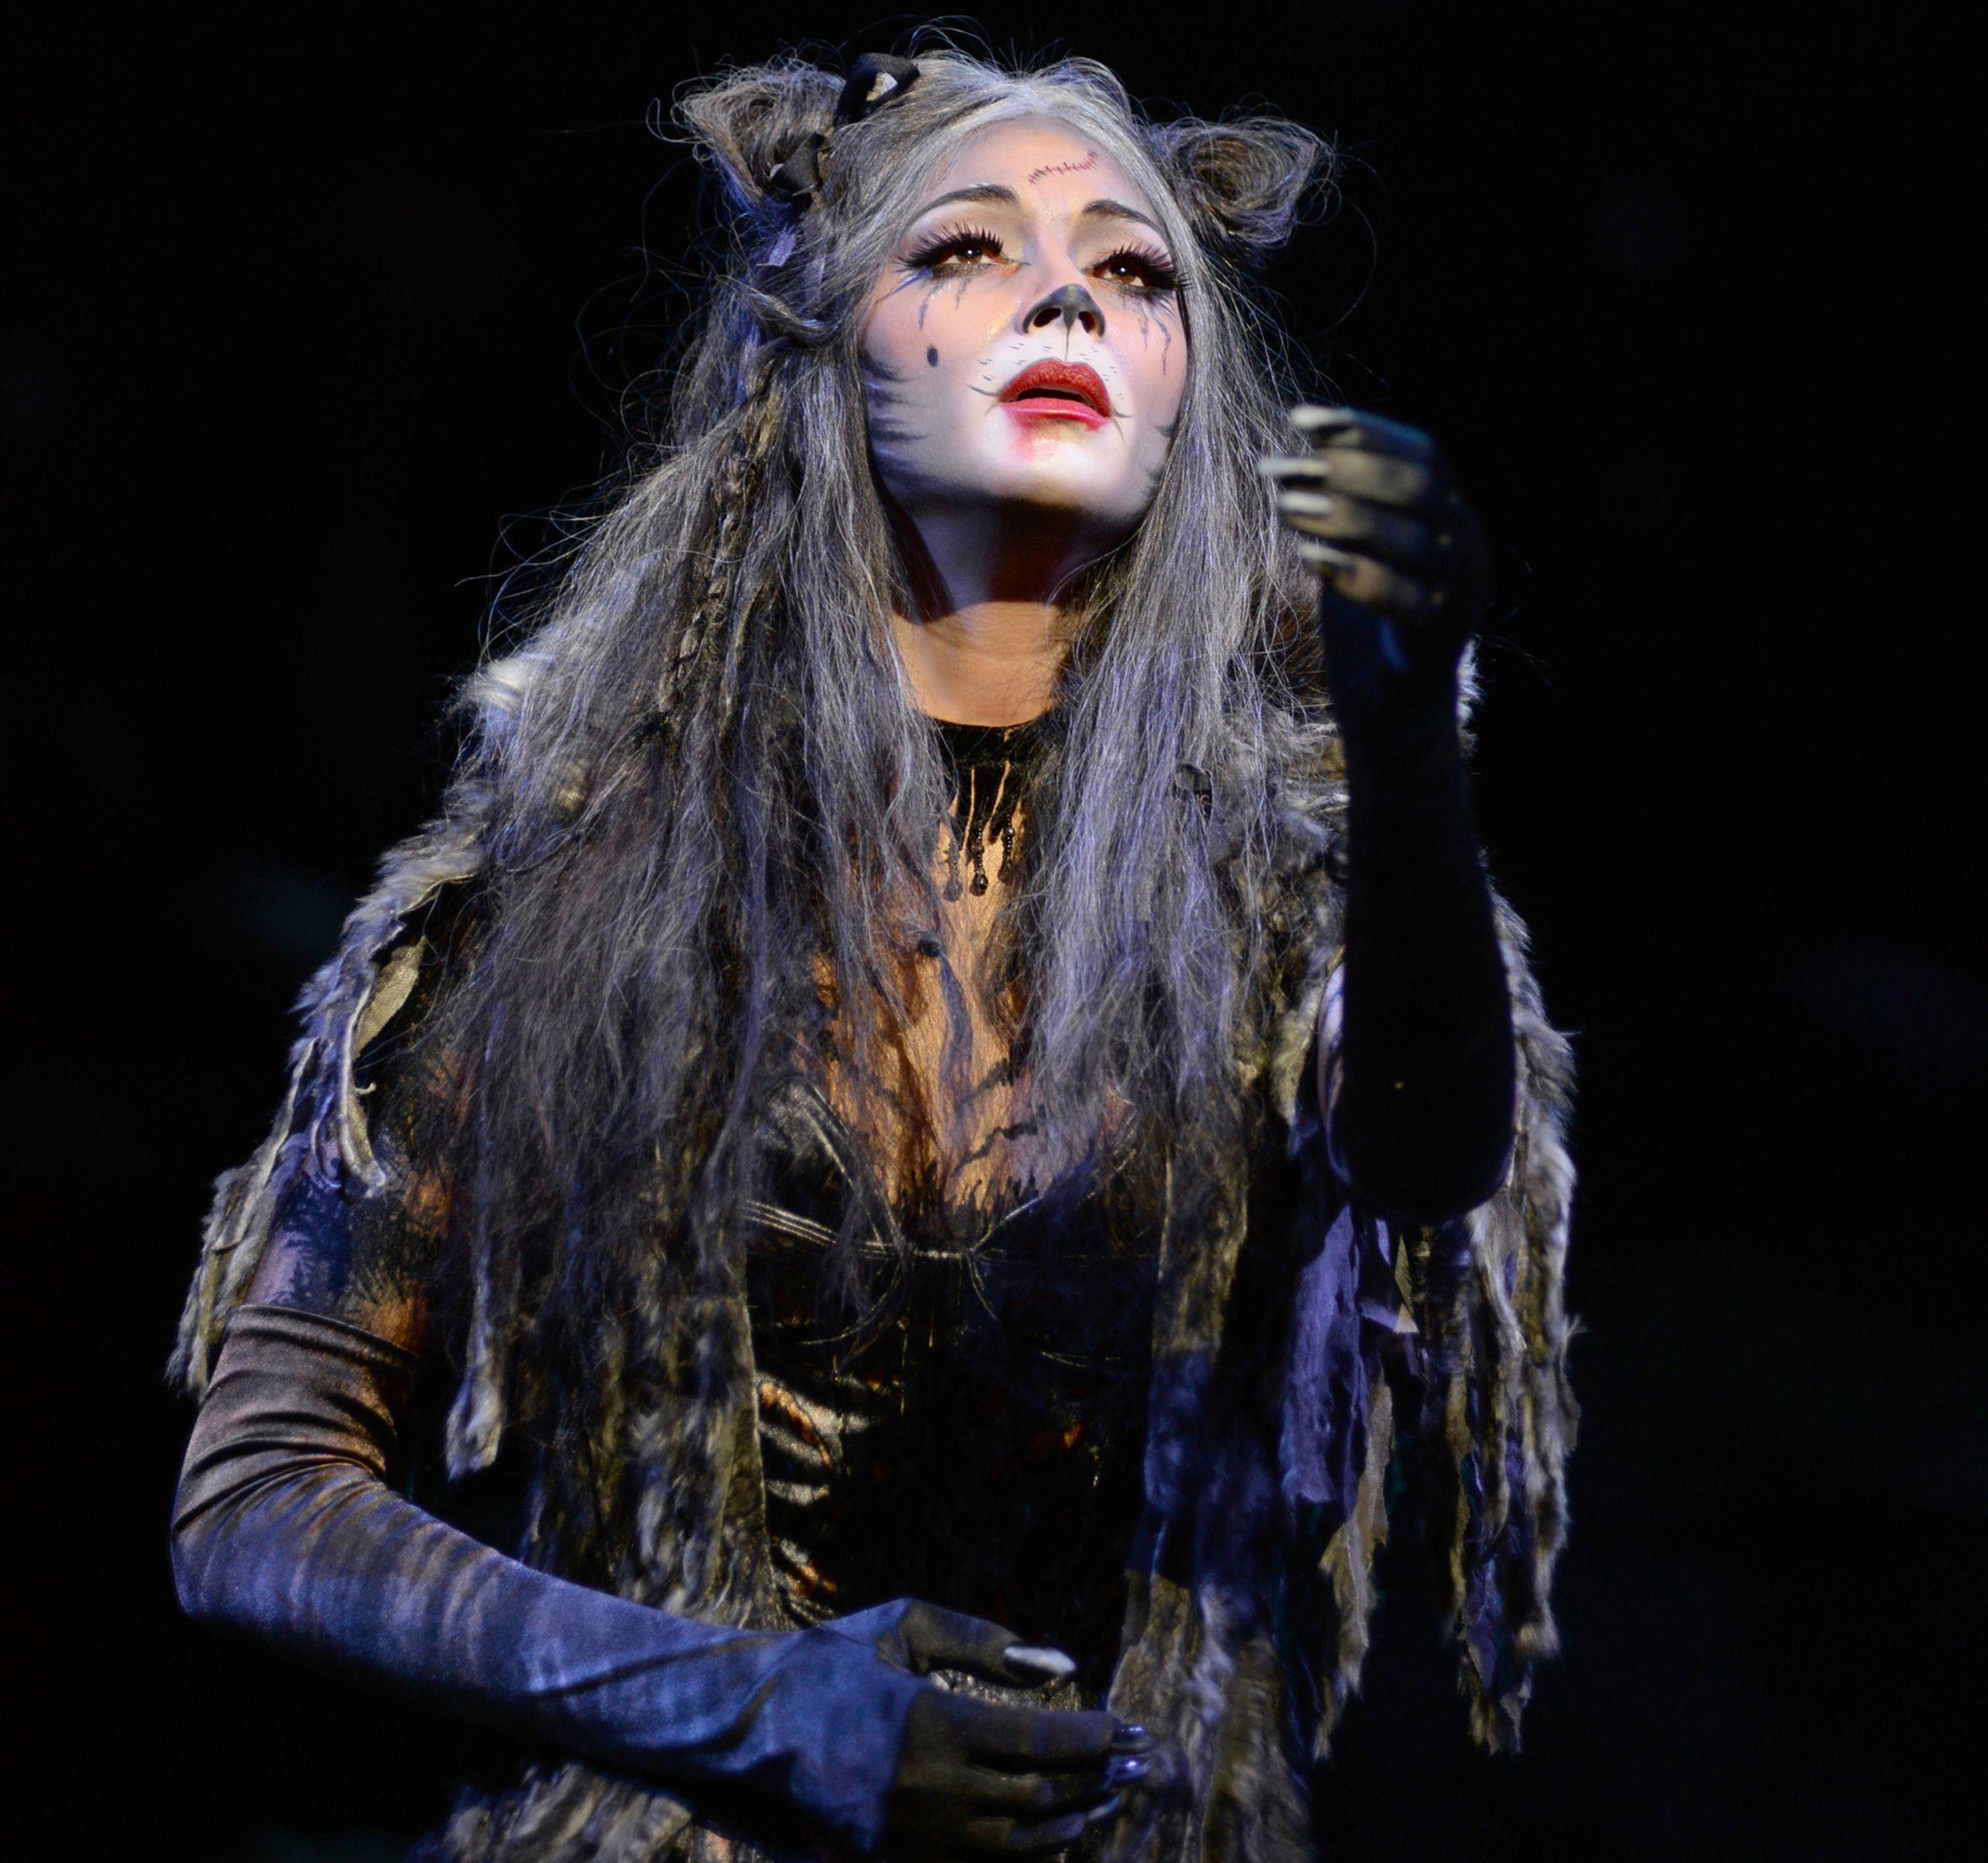 cats the musical 2015 Google Search Nicole scherzinger